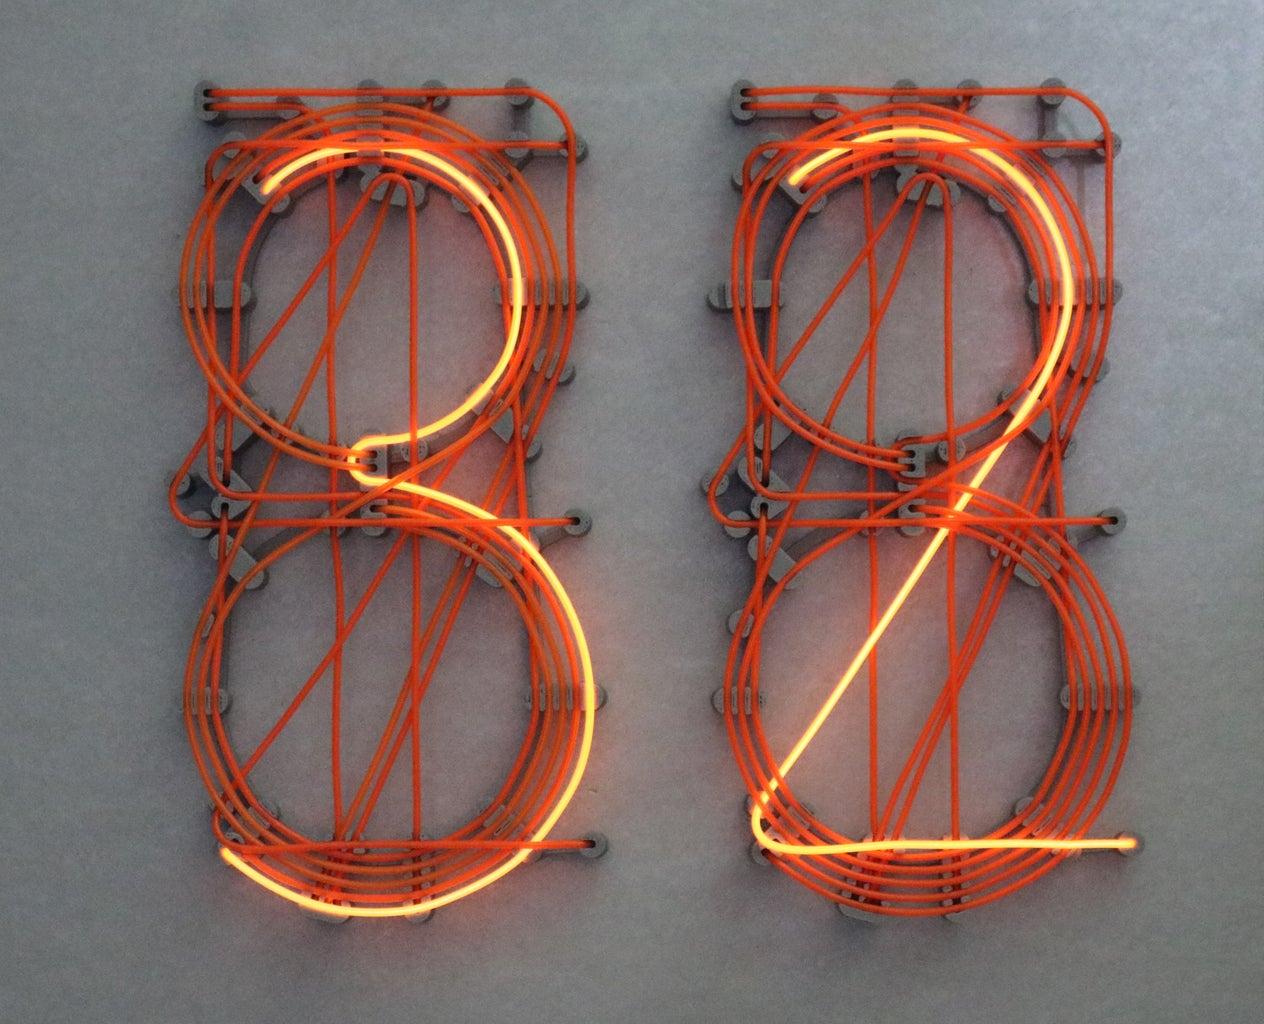 EL Wire Test